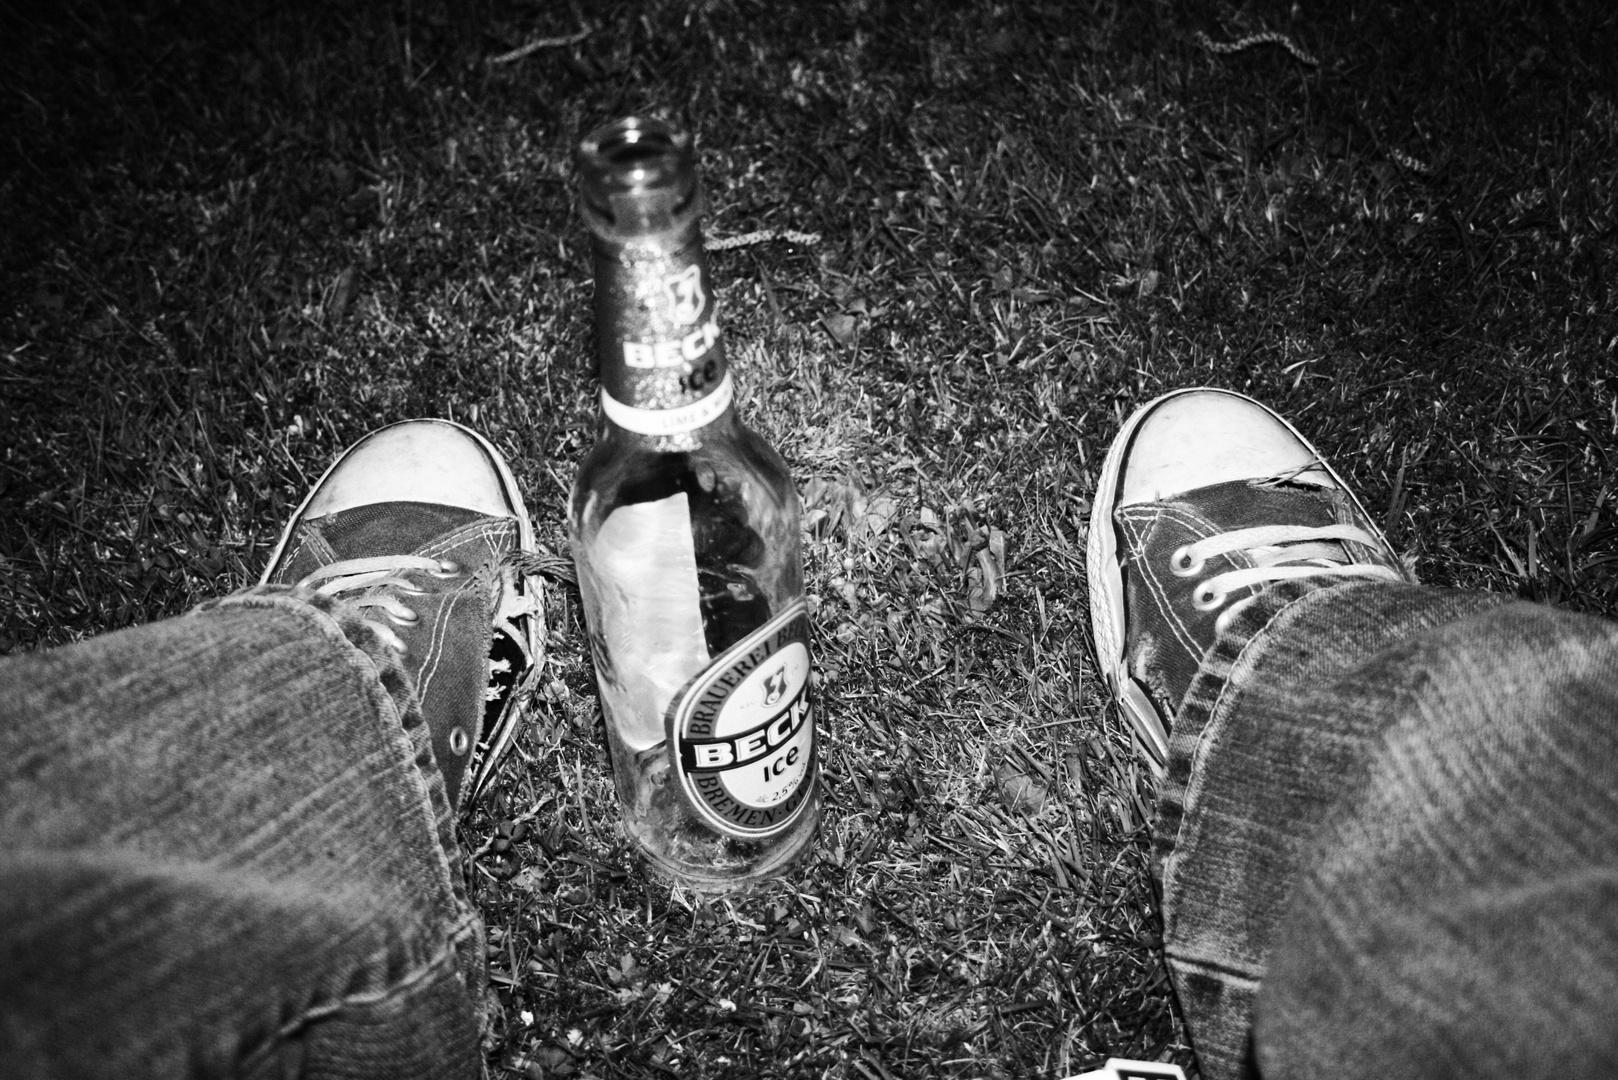 Chucks & Bier